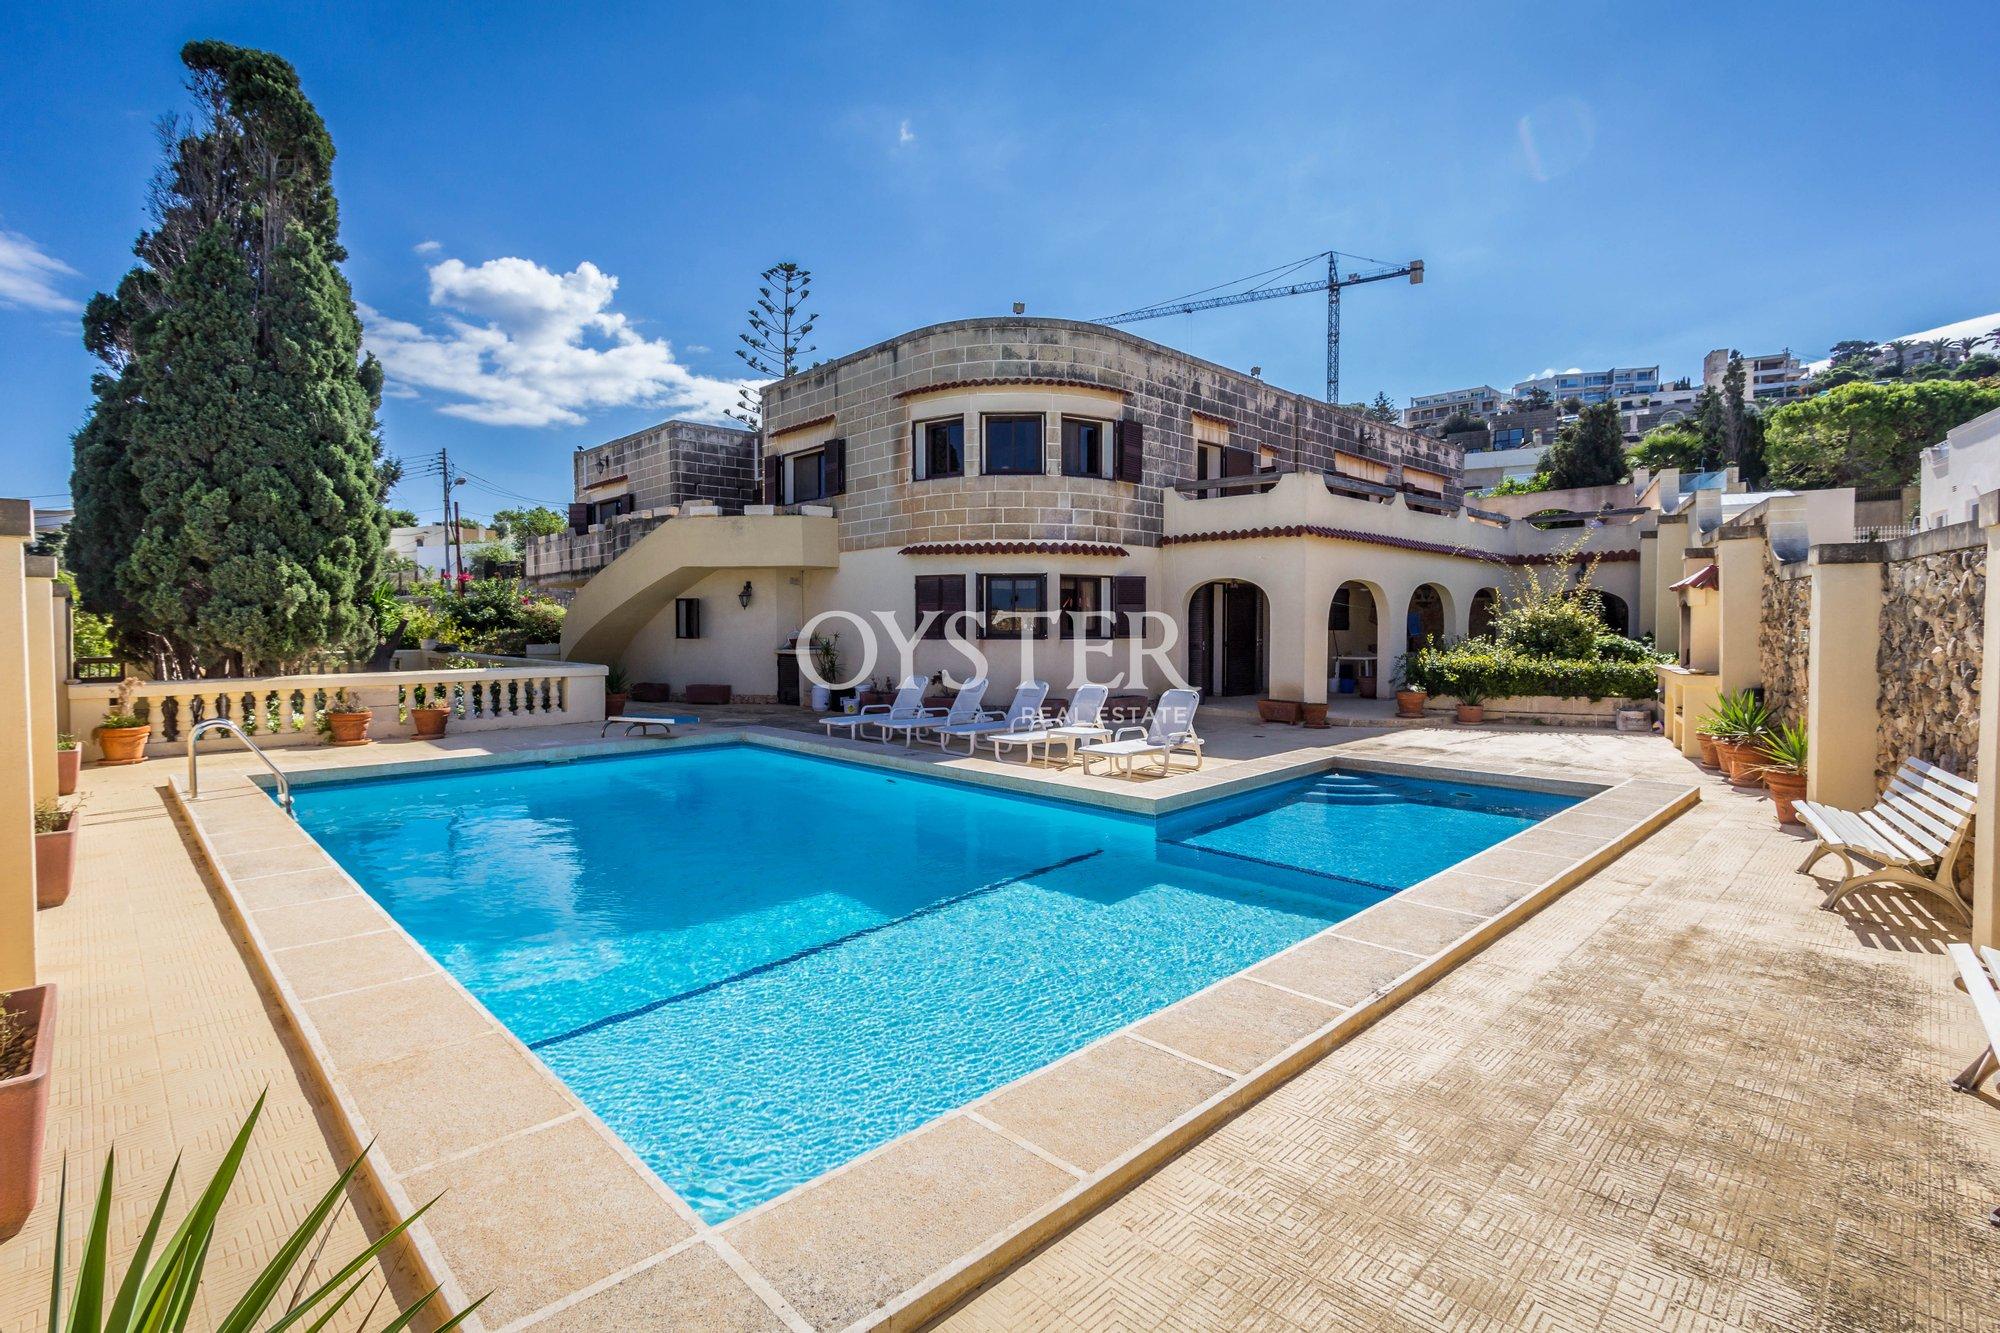 Bungalow a Nasciaro, Malta 1 - 11435326